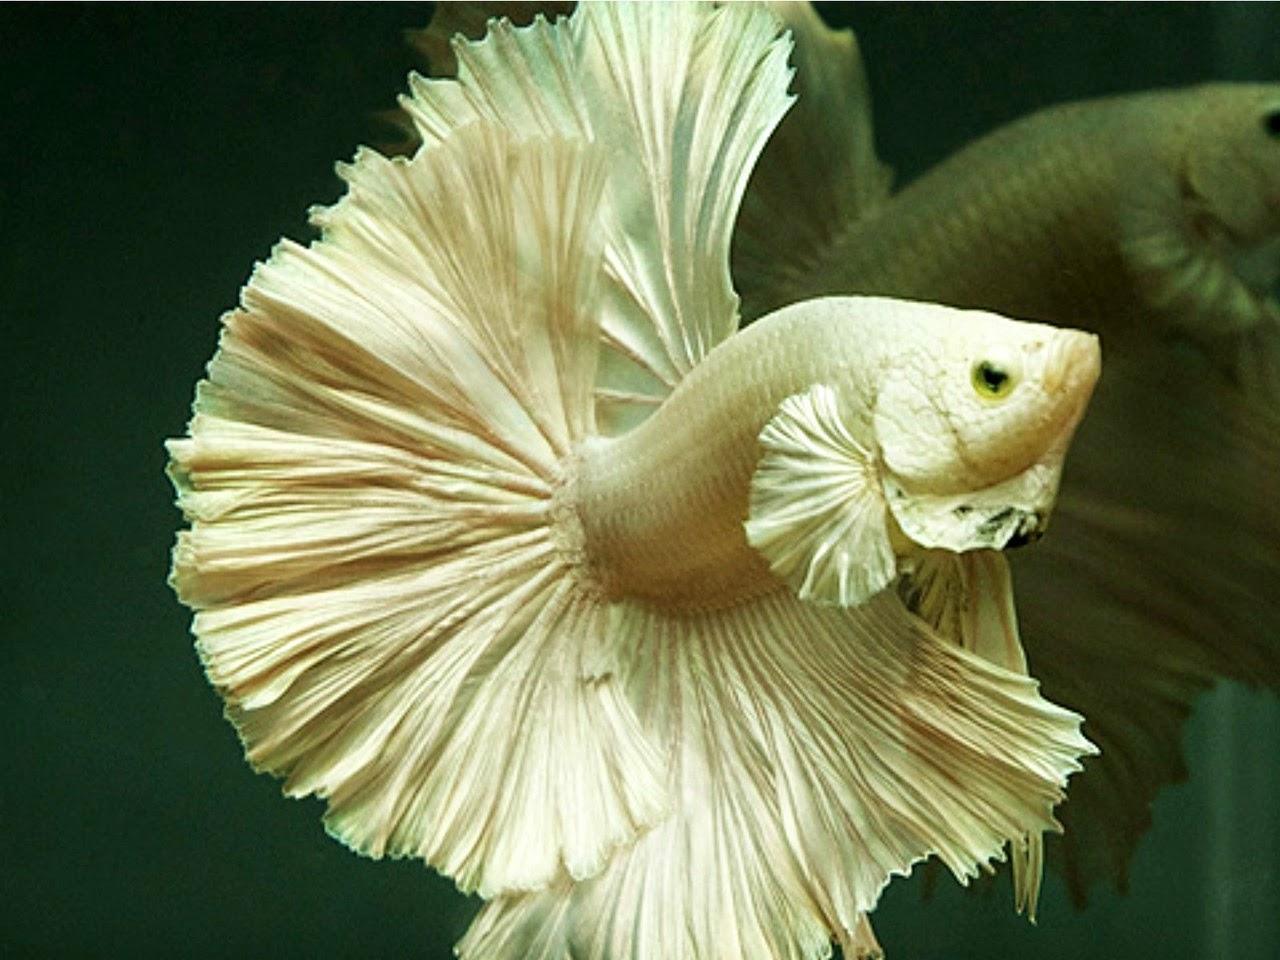 gambar ikan - gambar ikan cupang